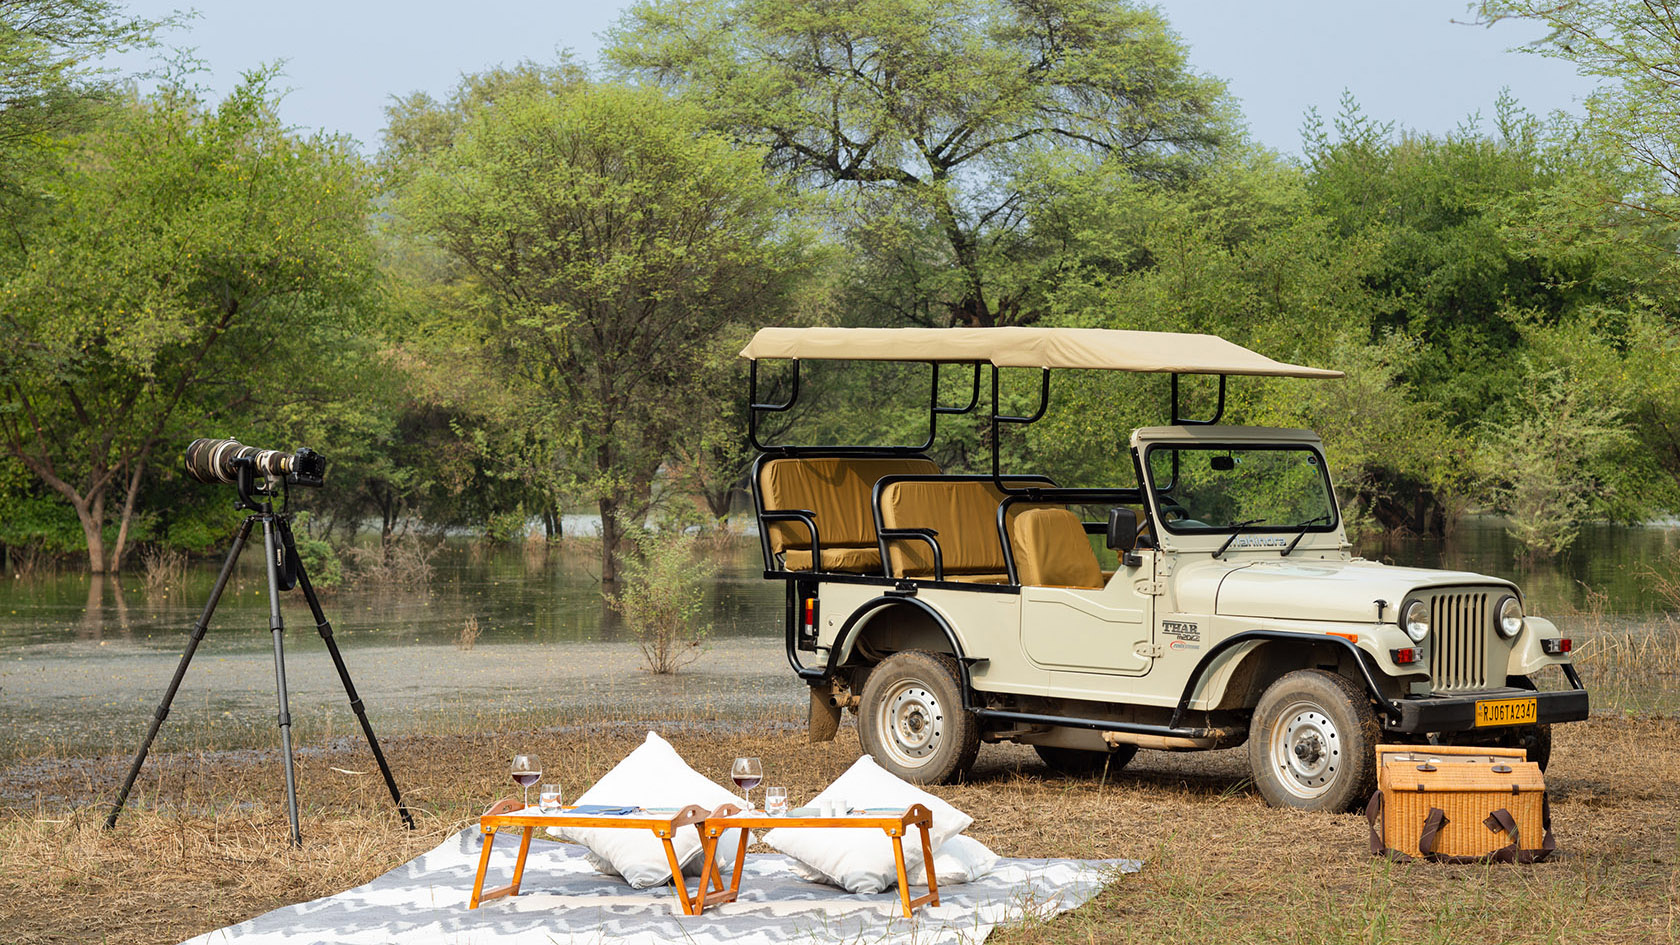 raas chhatrasagar birding picnic